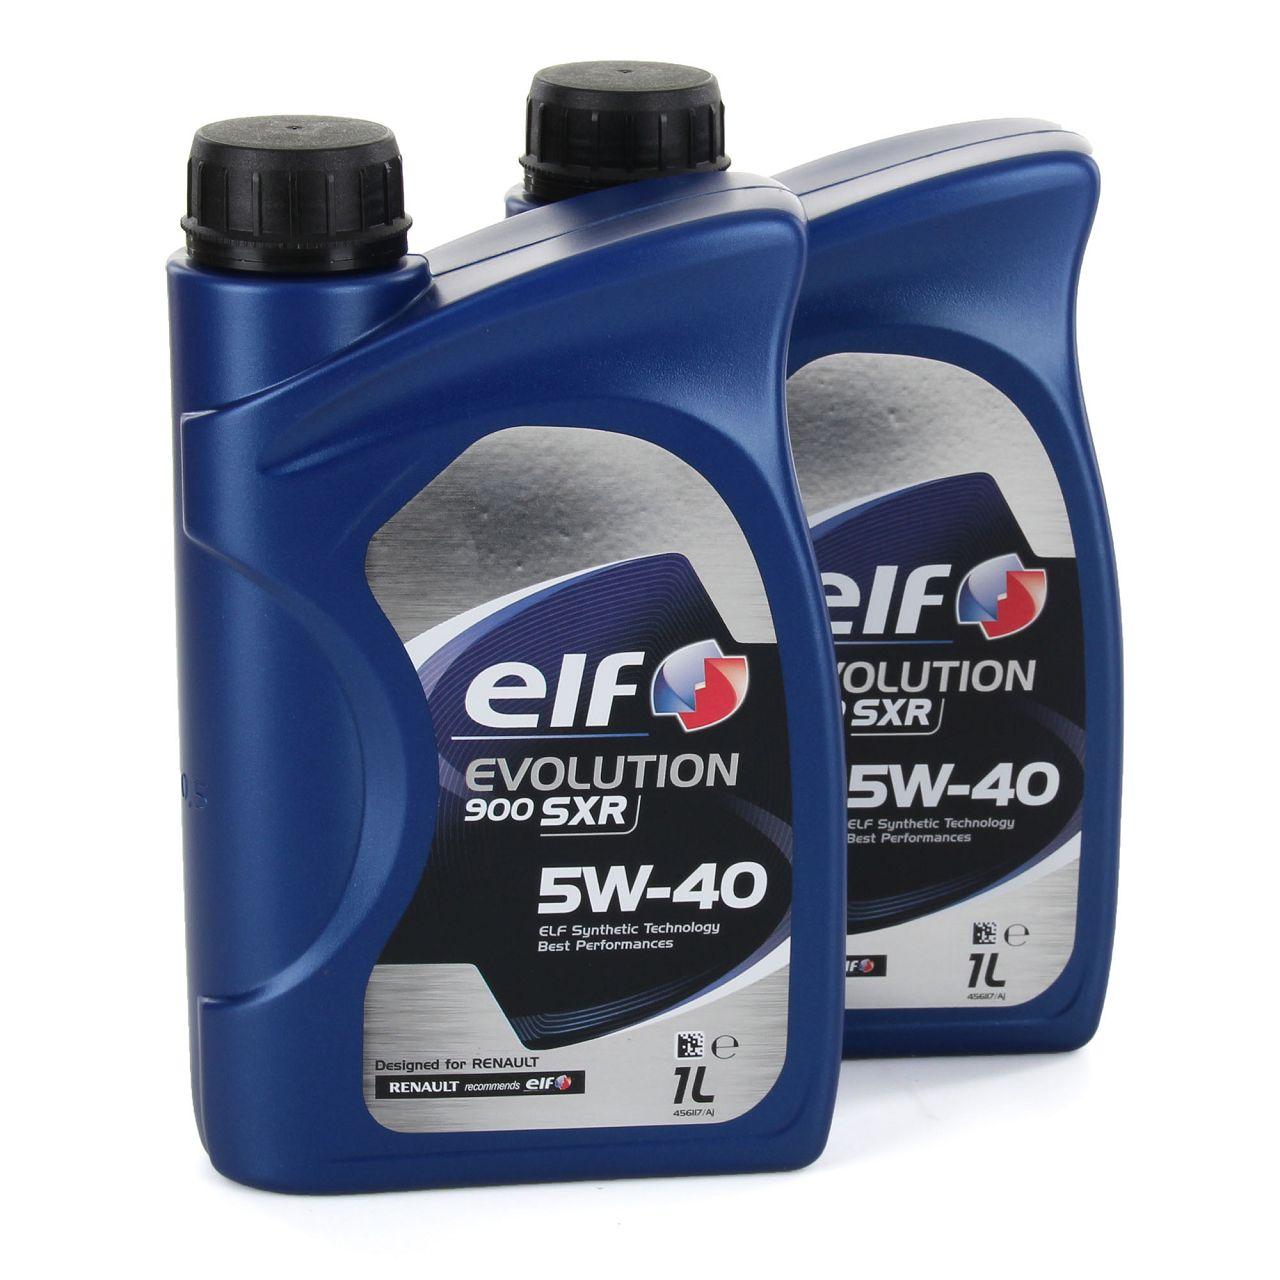 elf Evolution 900 SXR 5W-40 Motoröl RN0700 RN0710 MERCEDES 226.5 - 2L 2 Liter